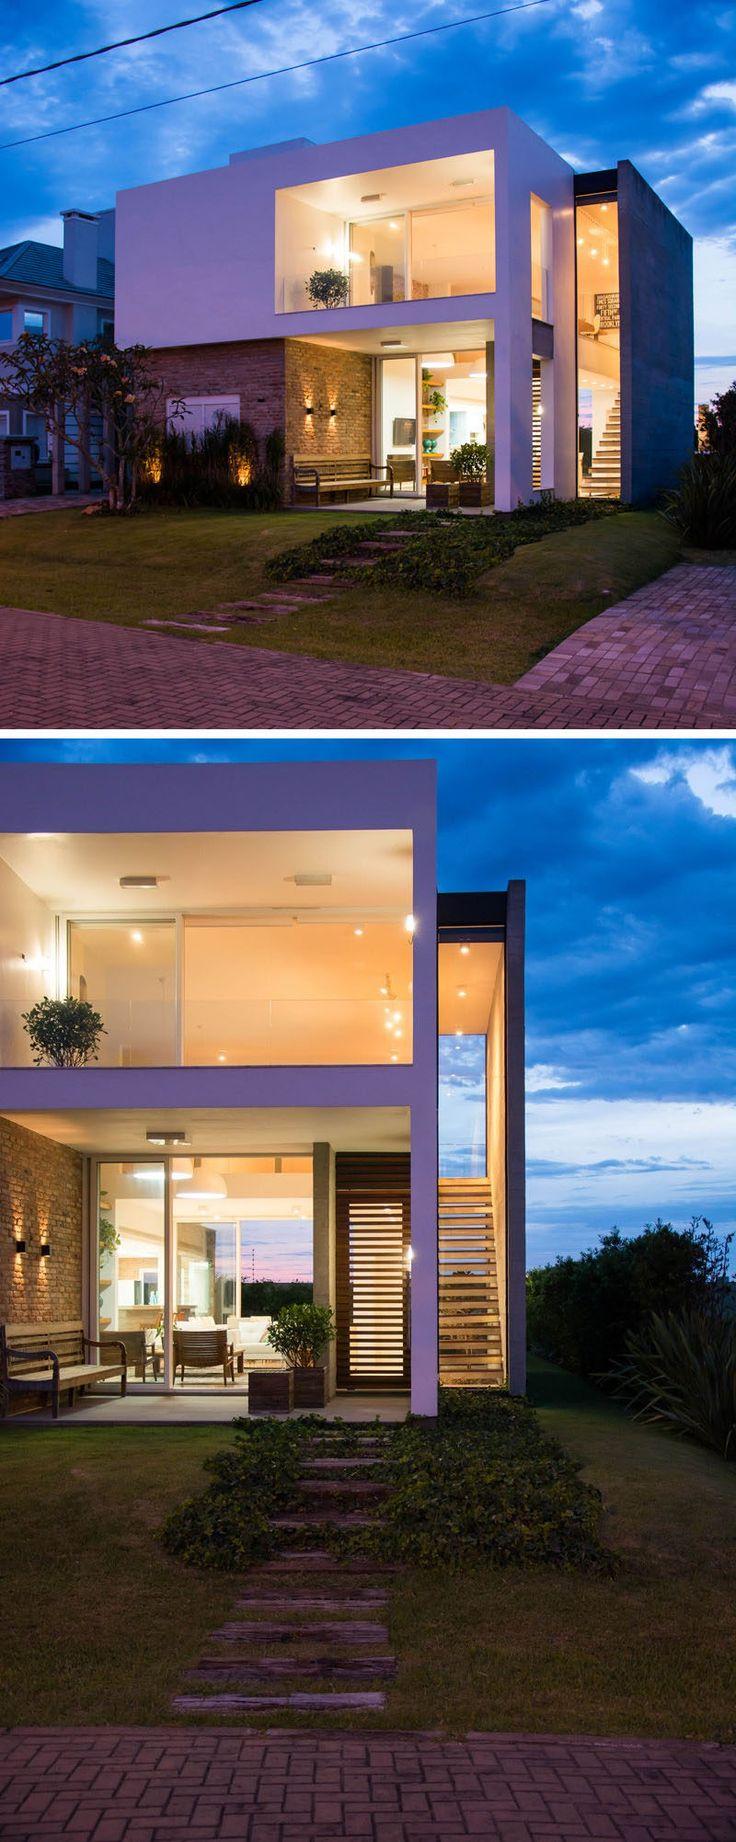 ESTUDIO 30 51 Designed Casa Ventura A Residence For A Family In Rio Grande  Do Sul, Brazil.